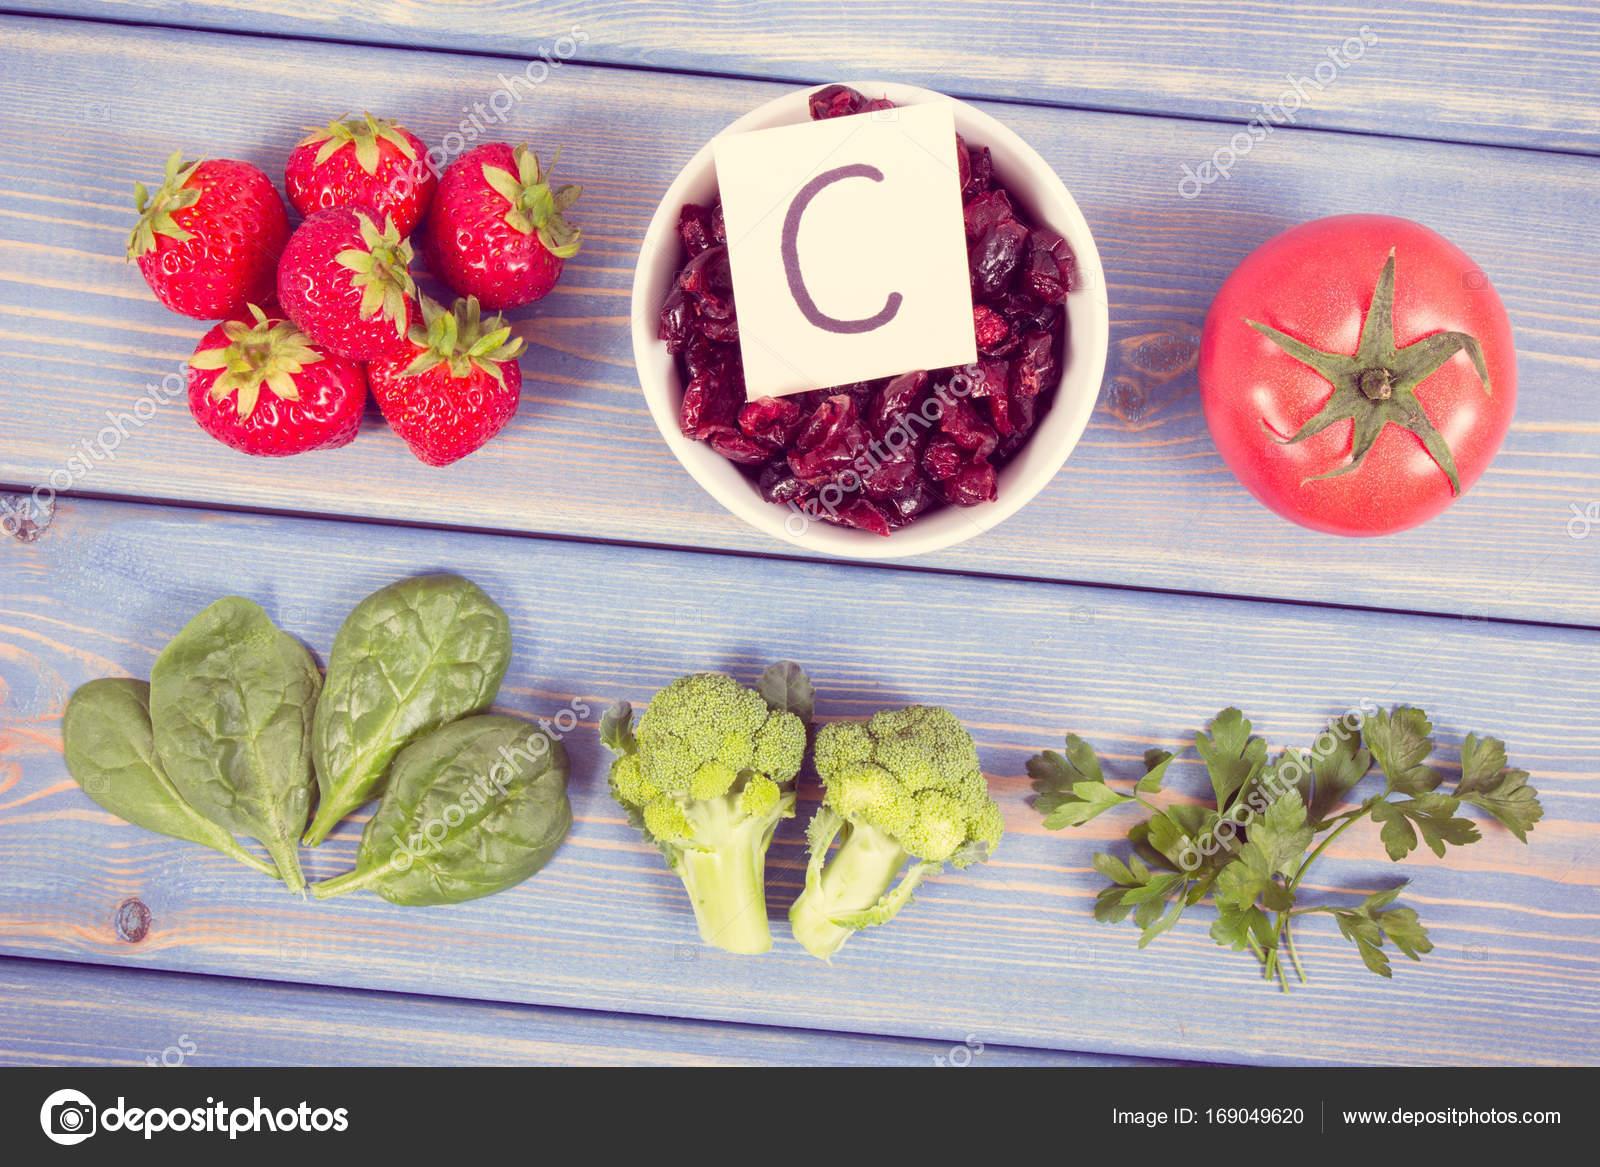 que vegetal contiene vitamina d